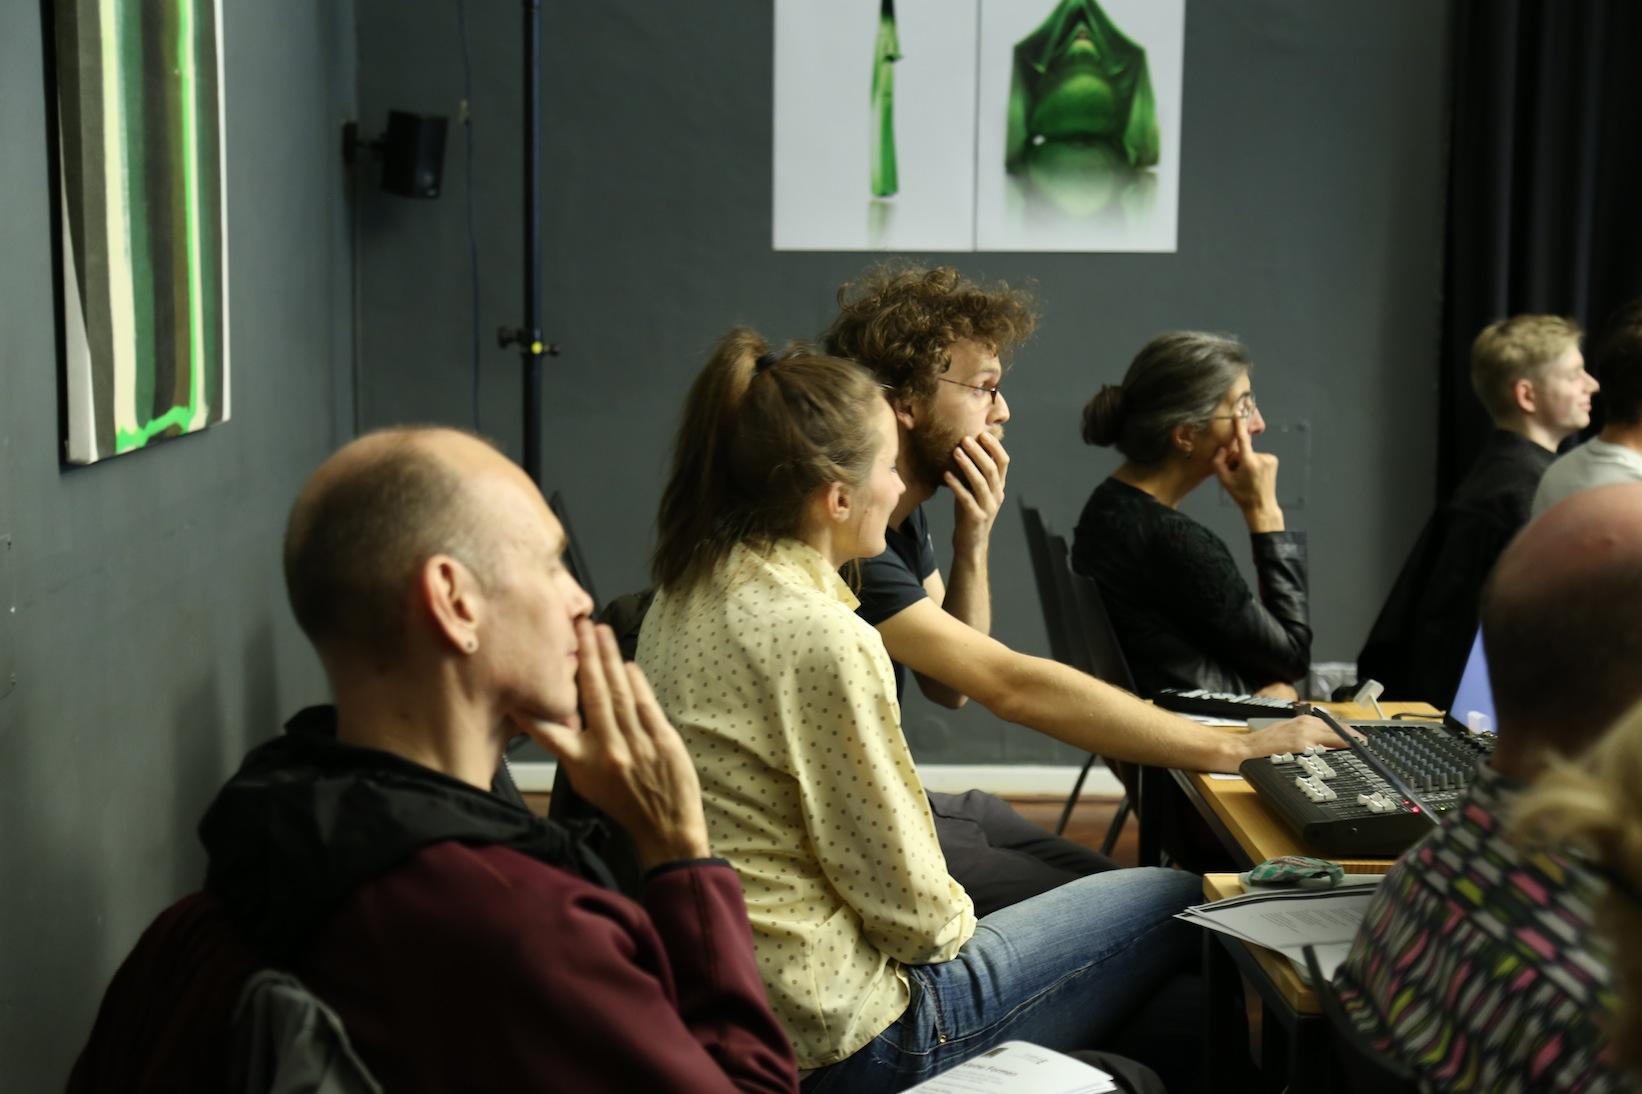 Marko Ciciliani, Caroline Profanter, Davide Gagliardi, Katharina Klement